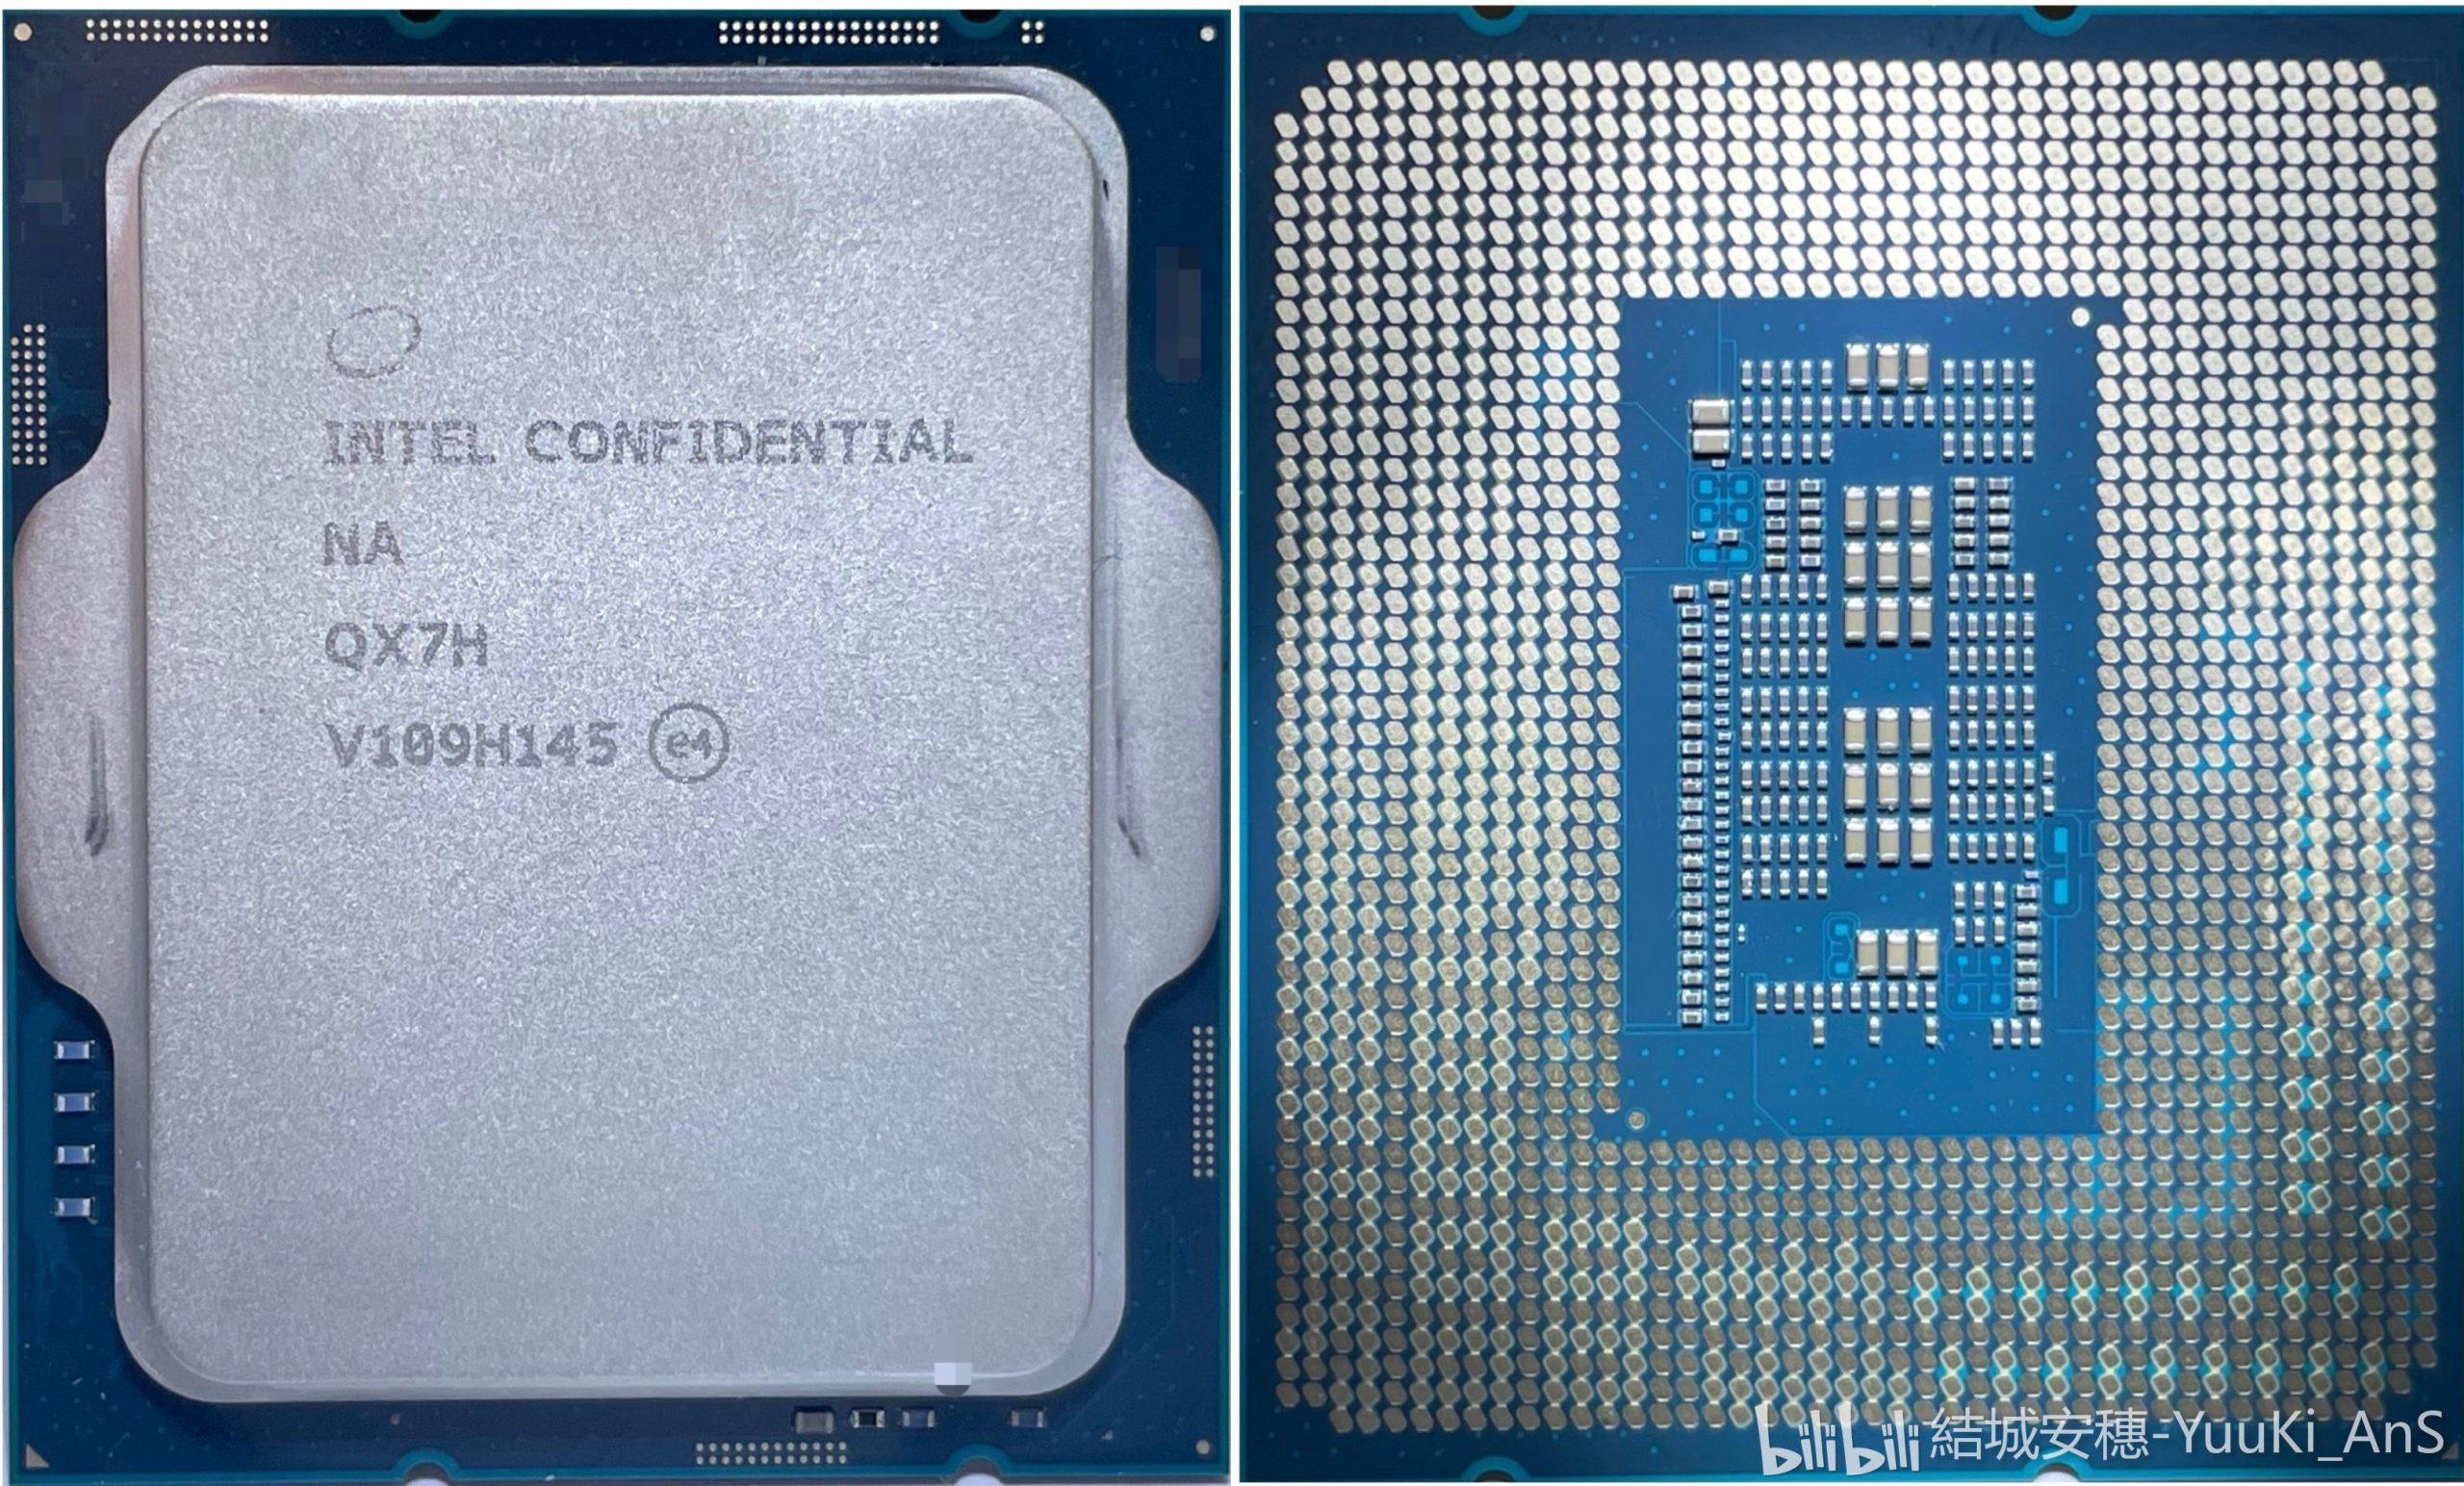 El Intel Core i9-12900K @ 5.20 GHz consigue superar al Ryzen 9 5950X en multinúcleo